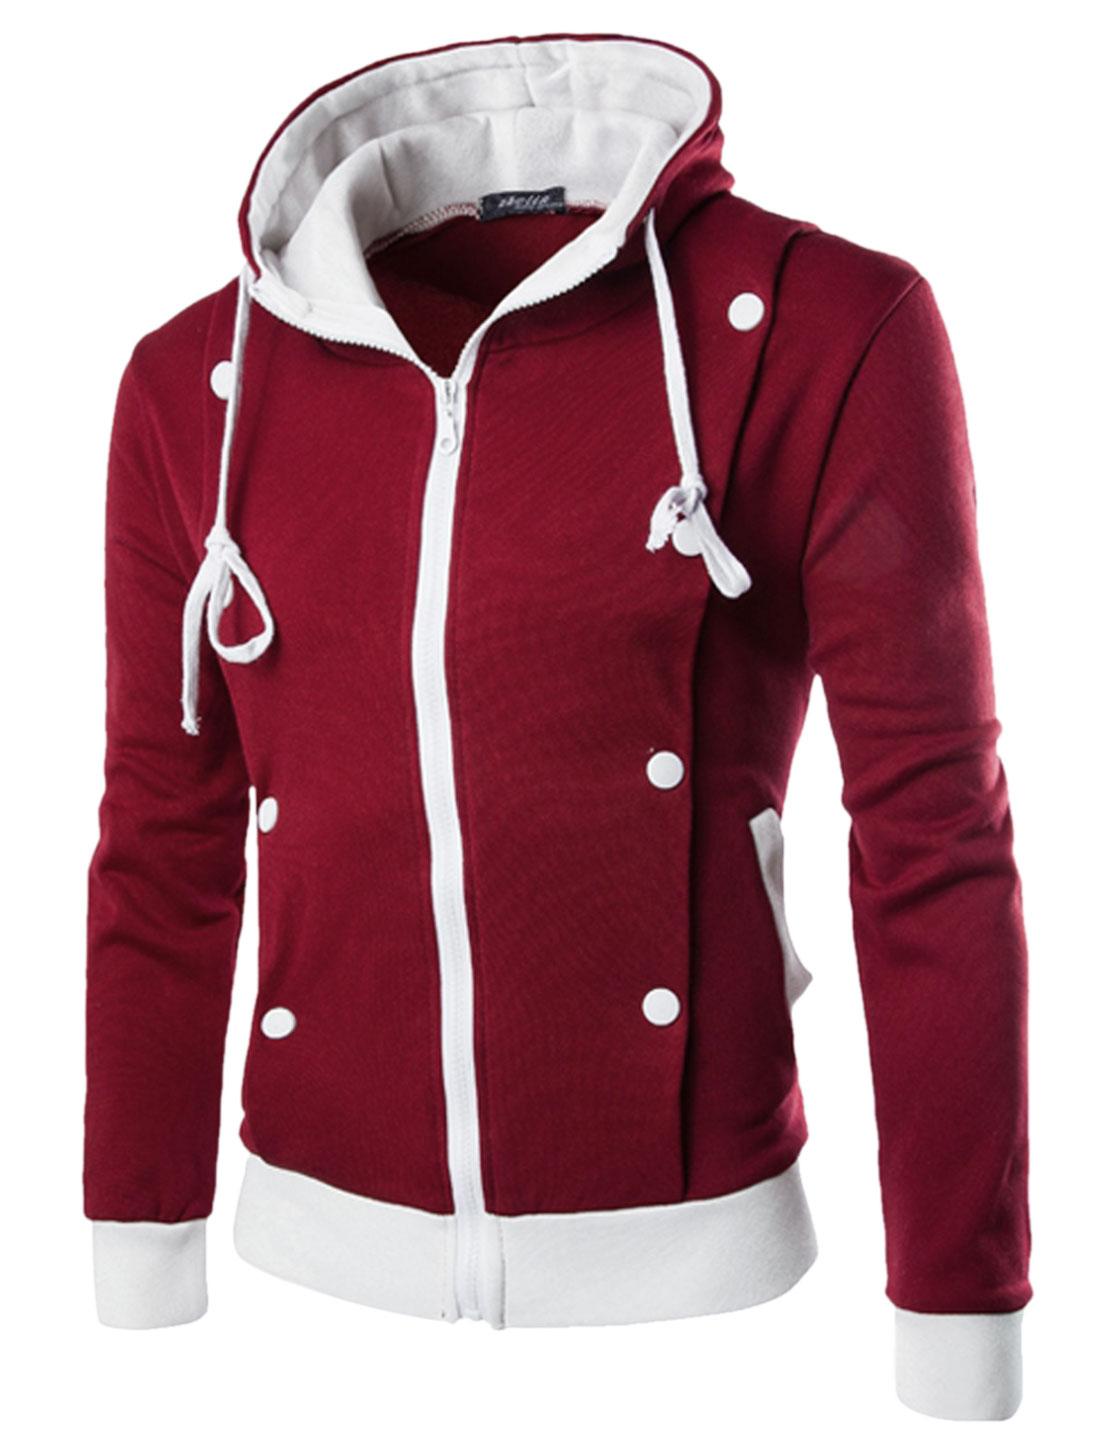 Men Long Sleeve Hooded Zip Closure Front Pocket Jacket Burgundy M